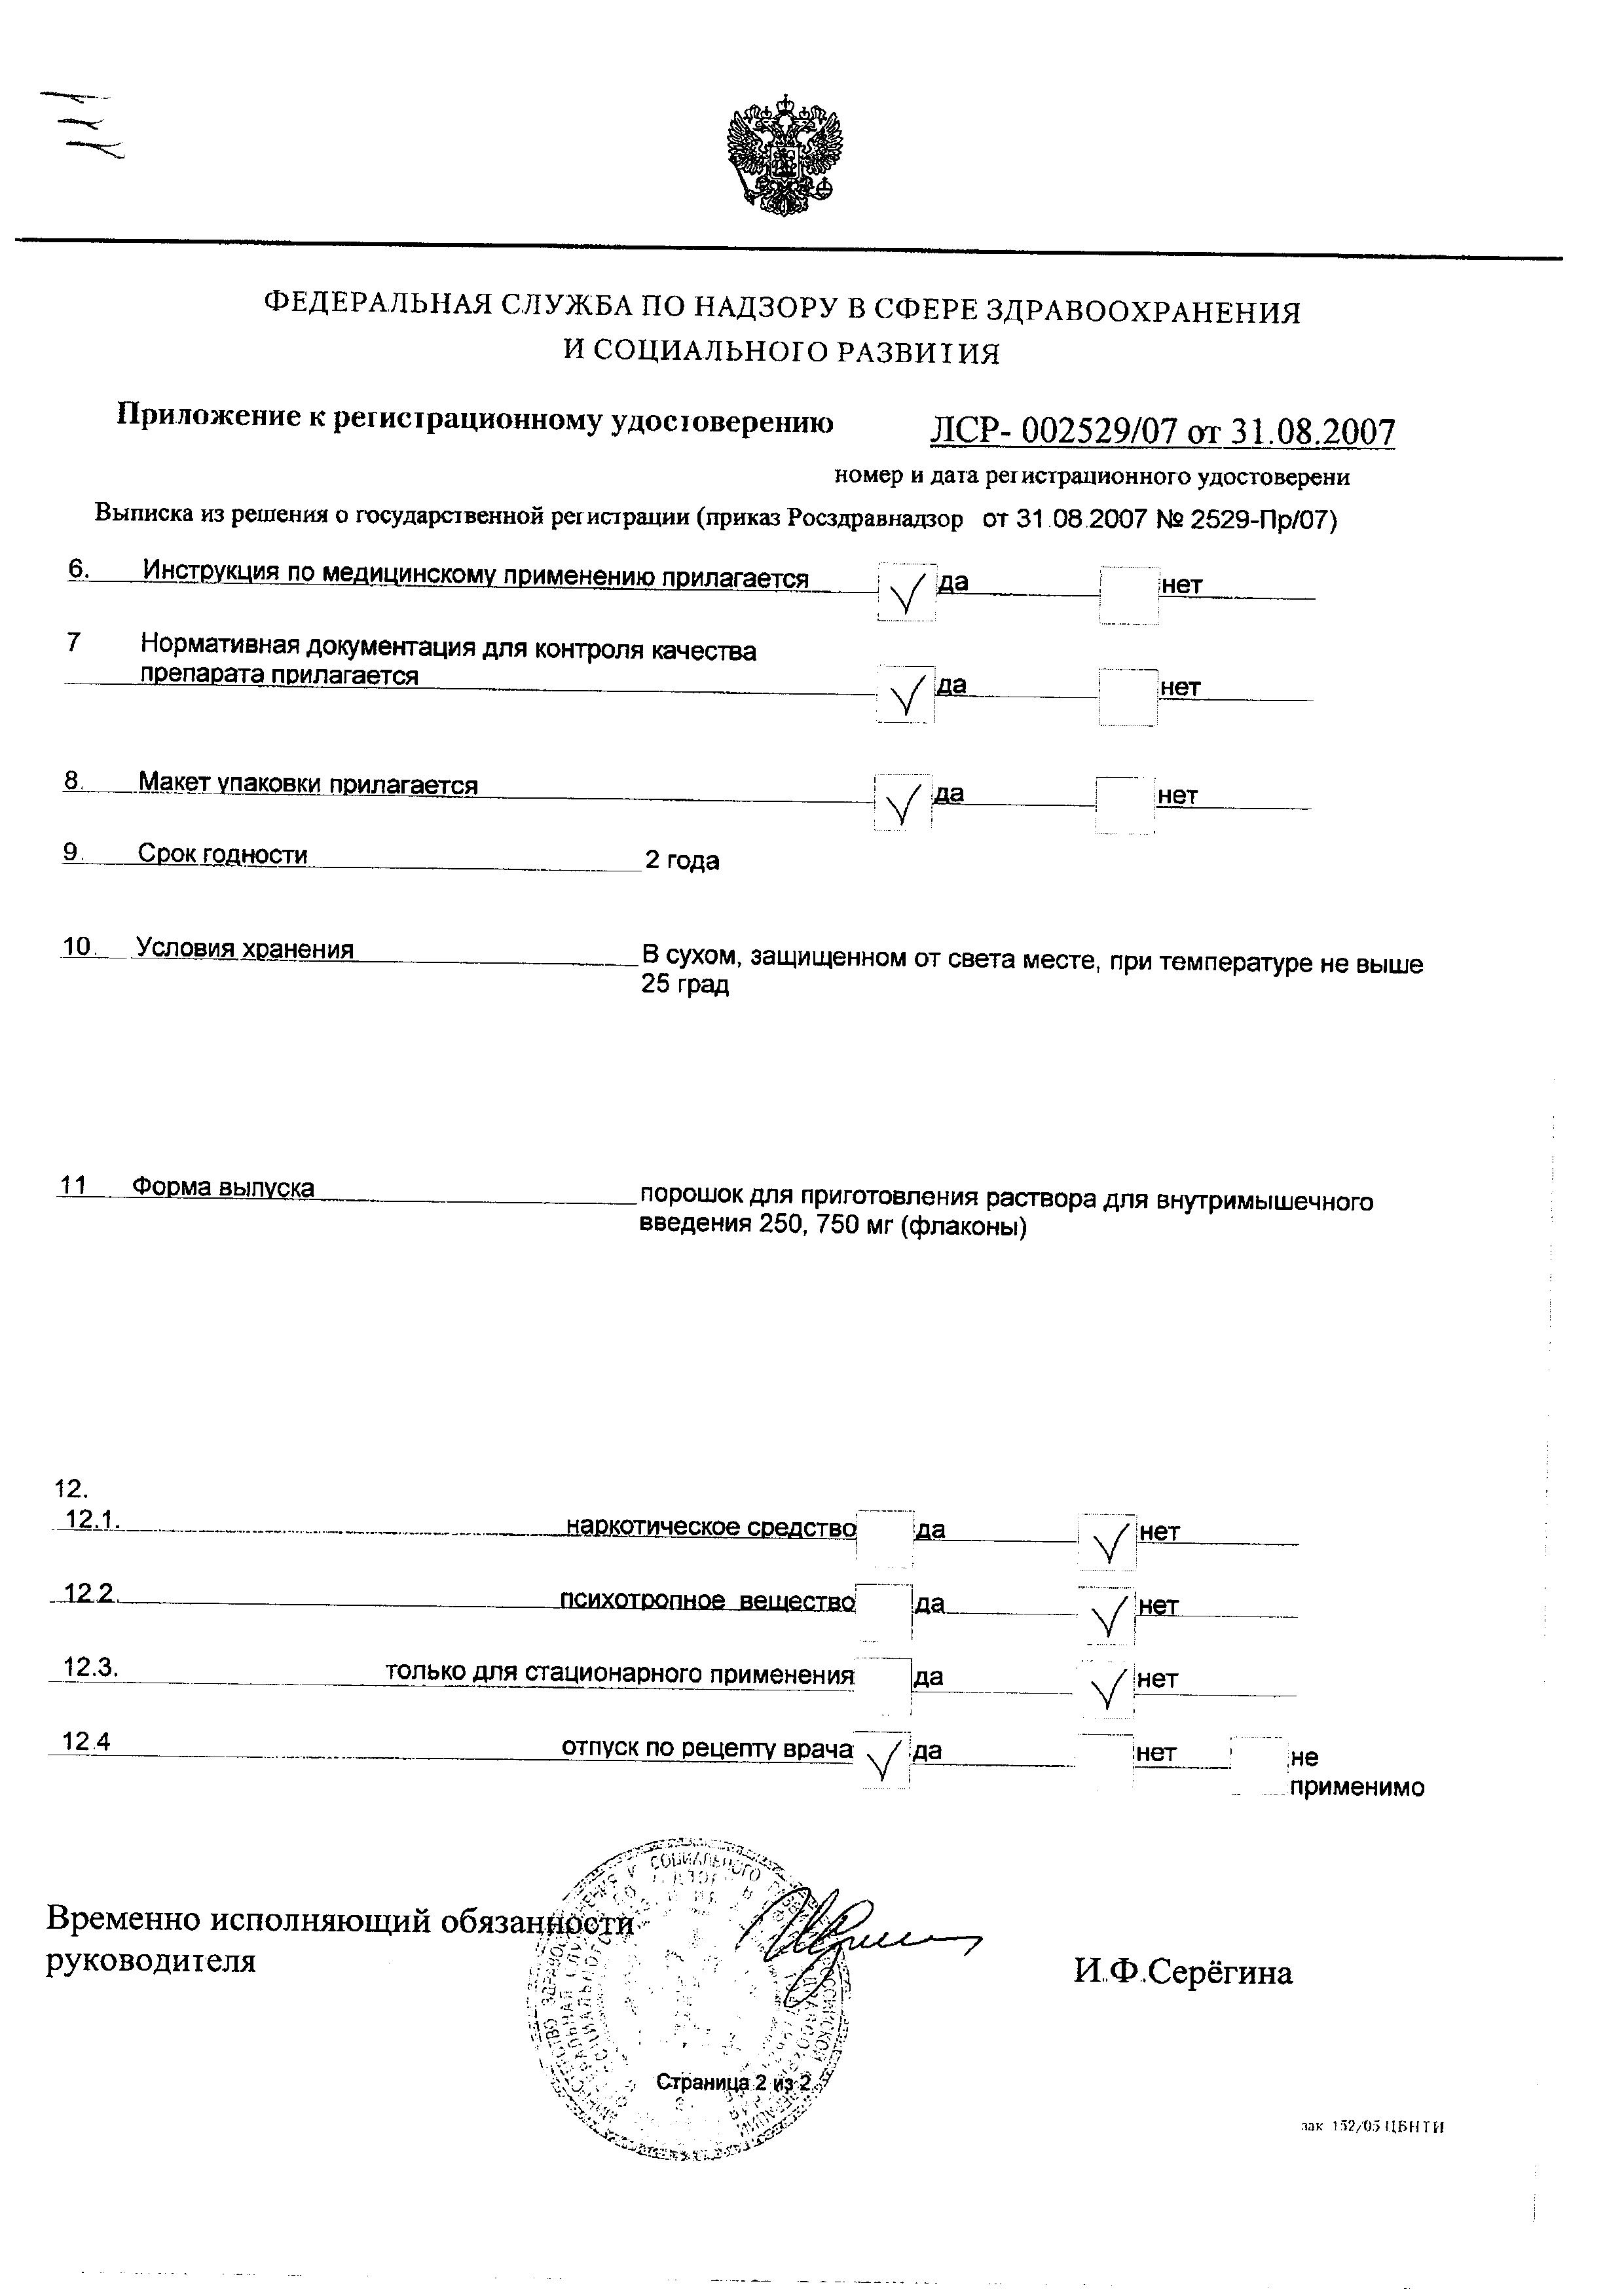 Цефуроксим сертификат